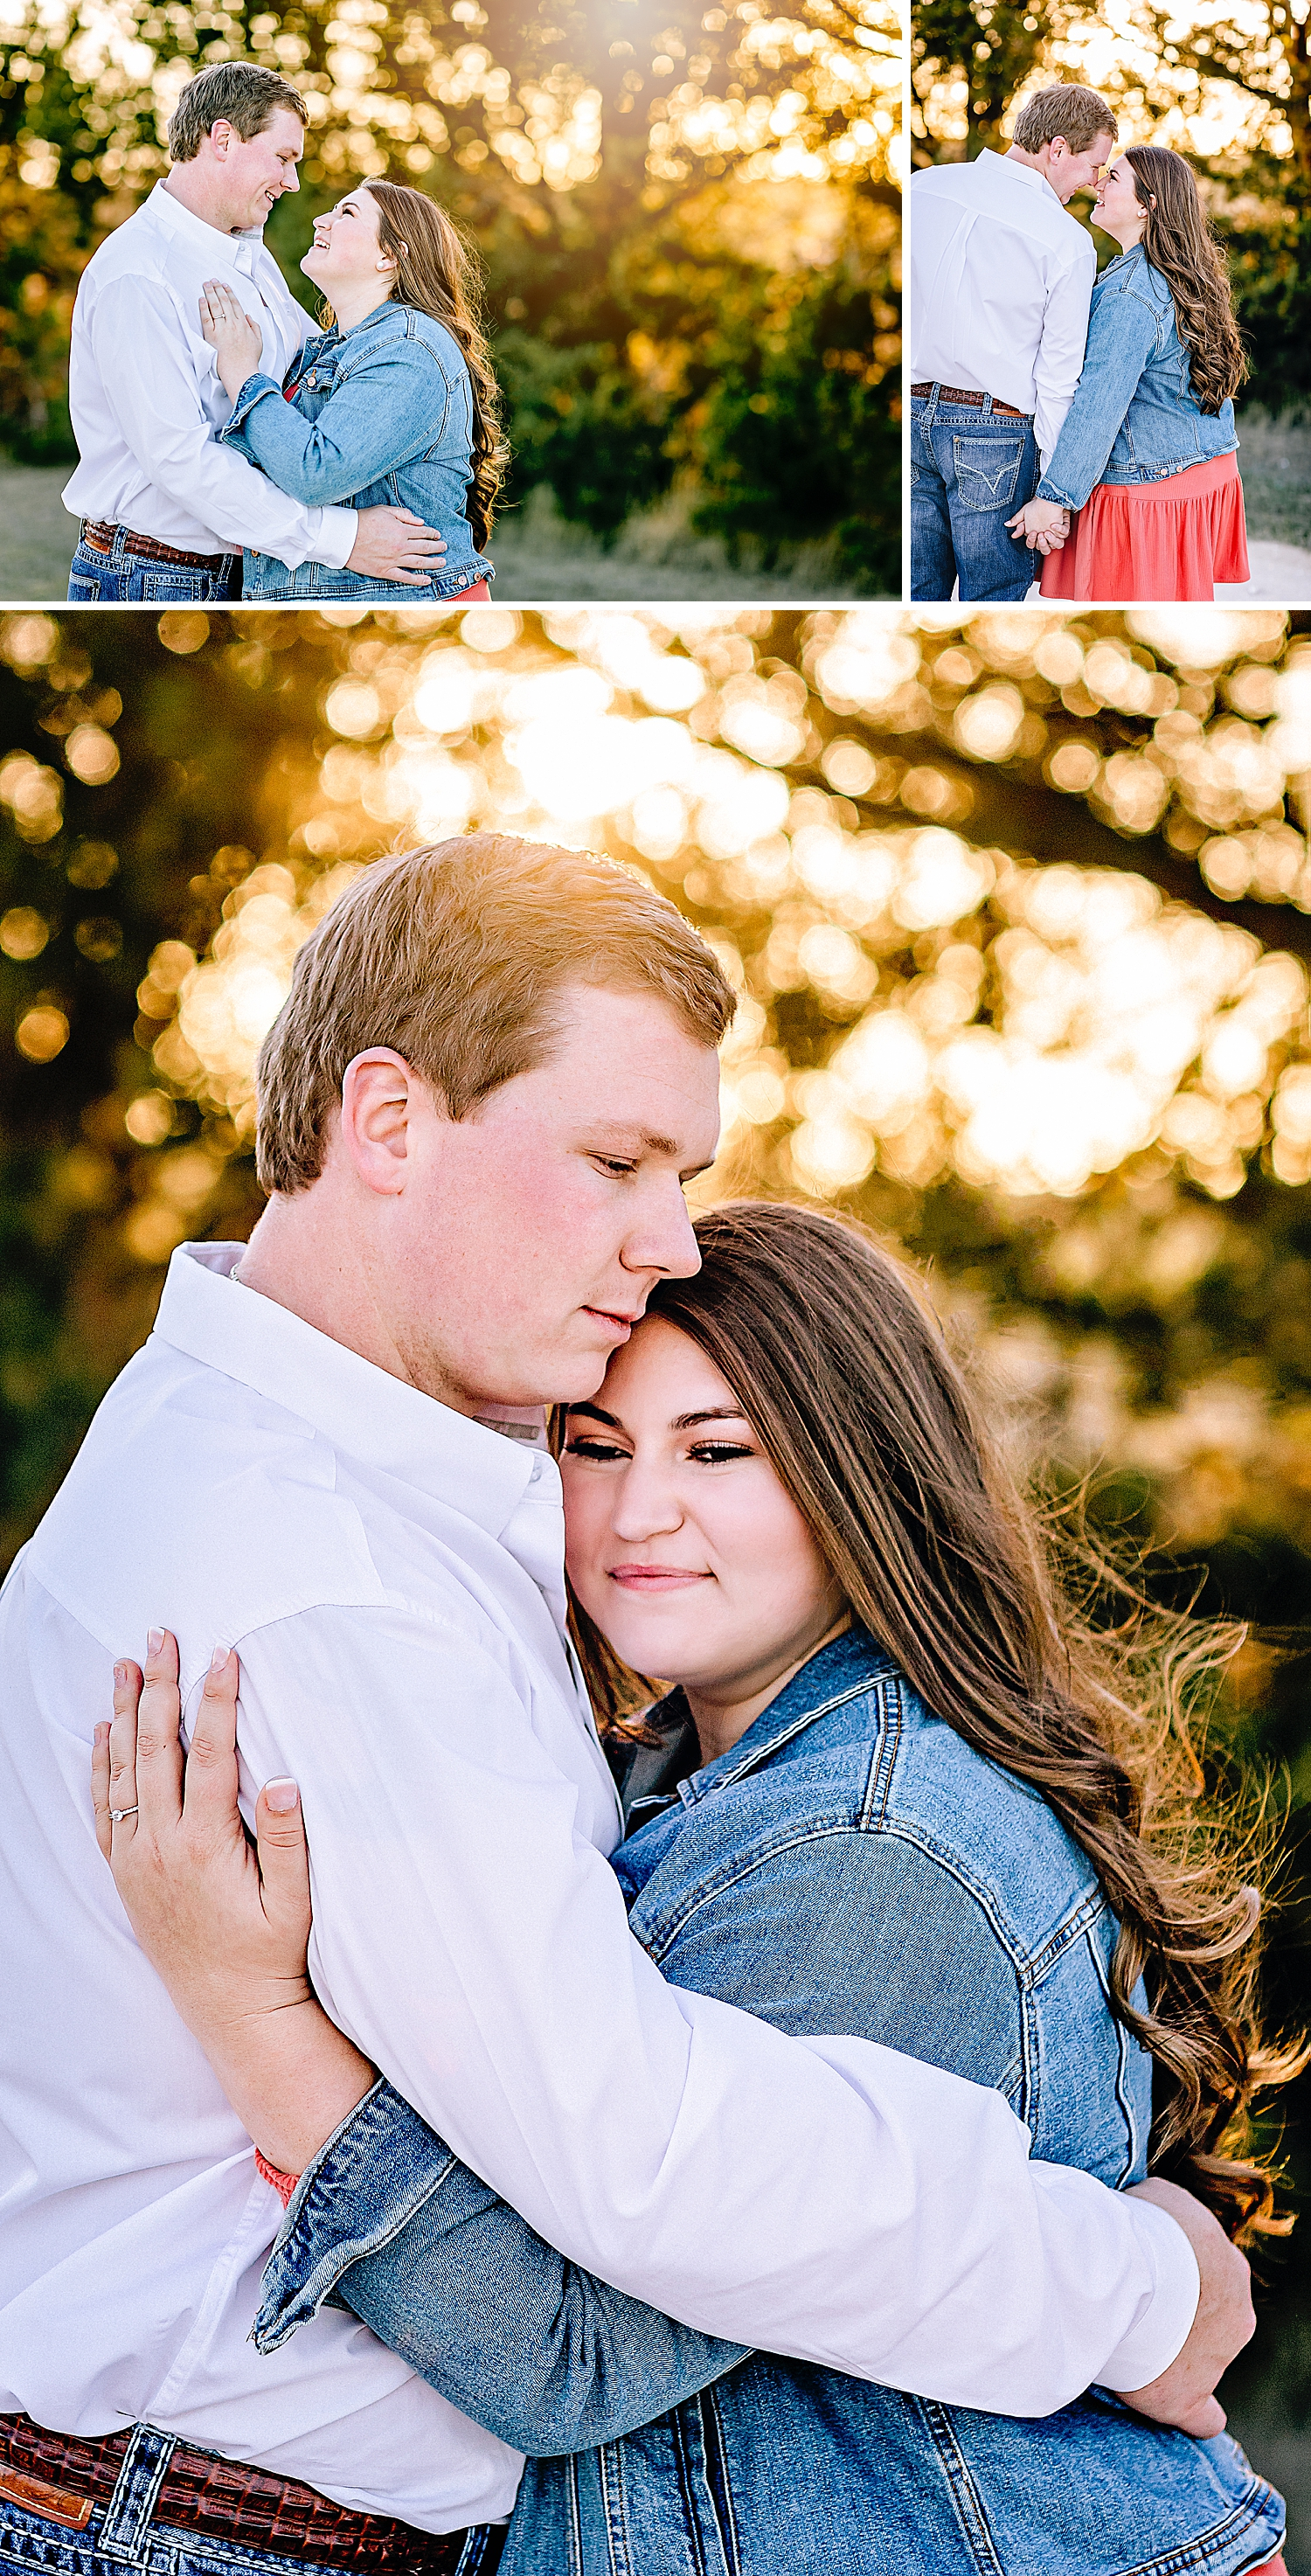 Engagement-photo-session-Western-Sky-wedding-venue-bulverde-texas-carly-barton-photography_0004.jpg